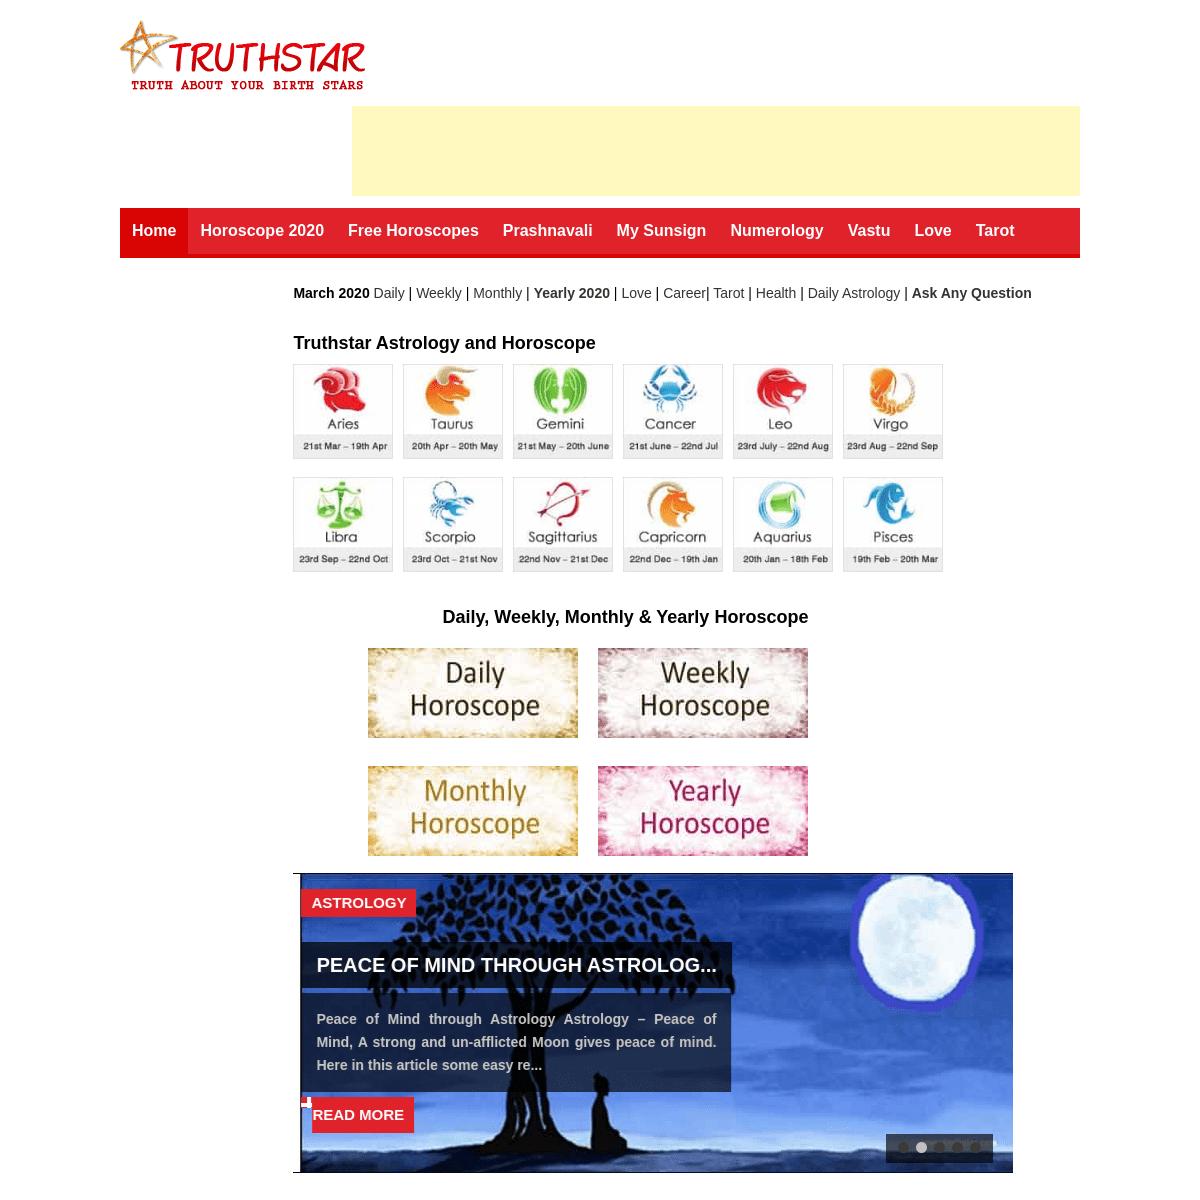 Truthstar- Free Horoscope, Online Astrology and Tarot